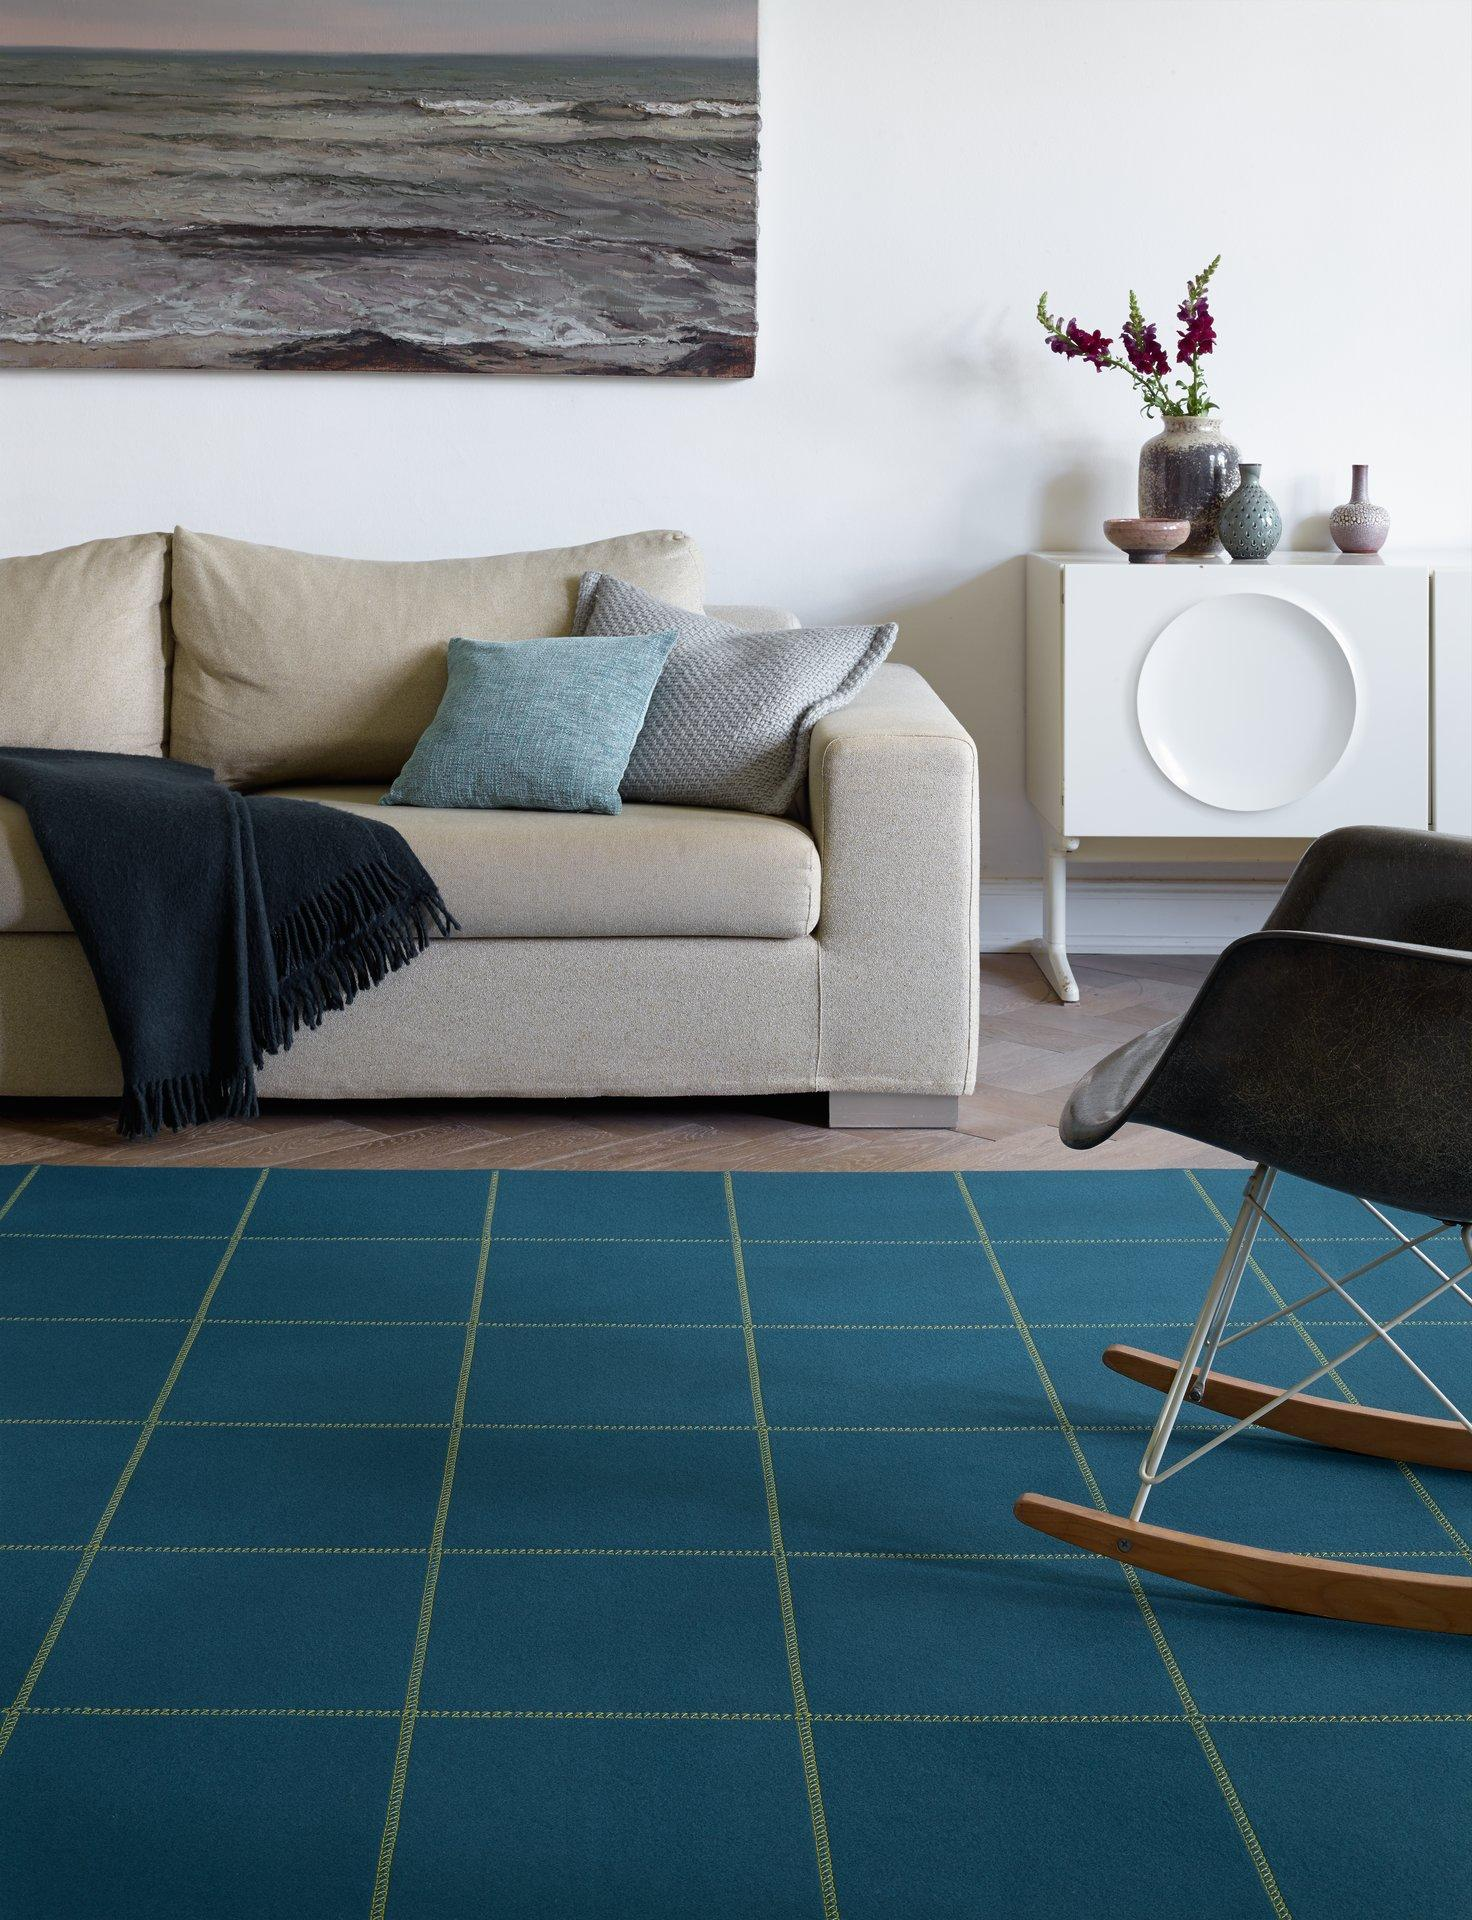 tagesdecke bilder ideen couchstyle. Black Bedroom Furniture Sets. Home Design Ideas